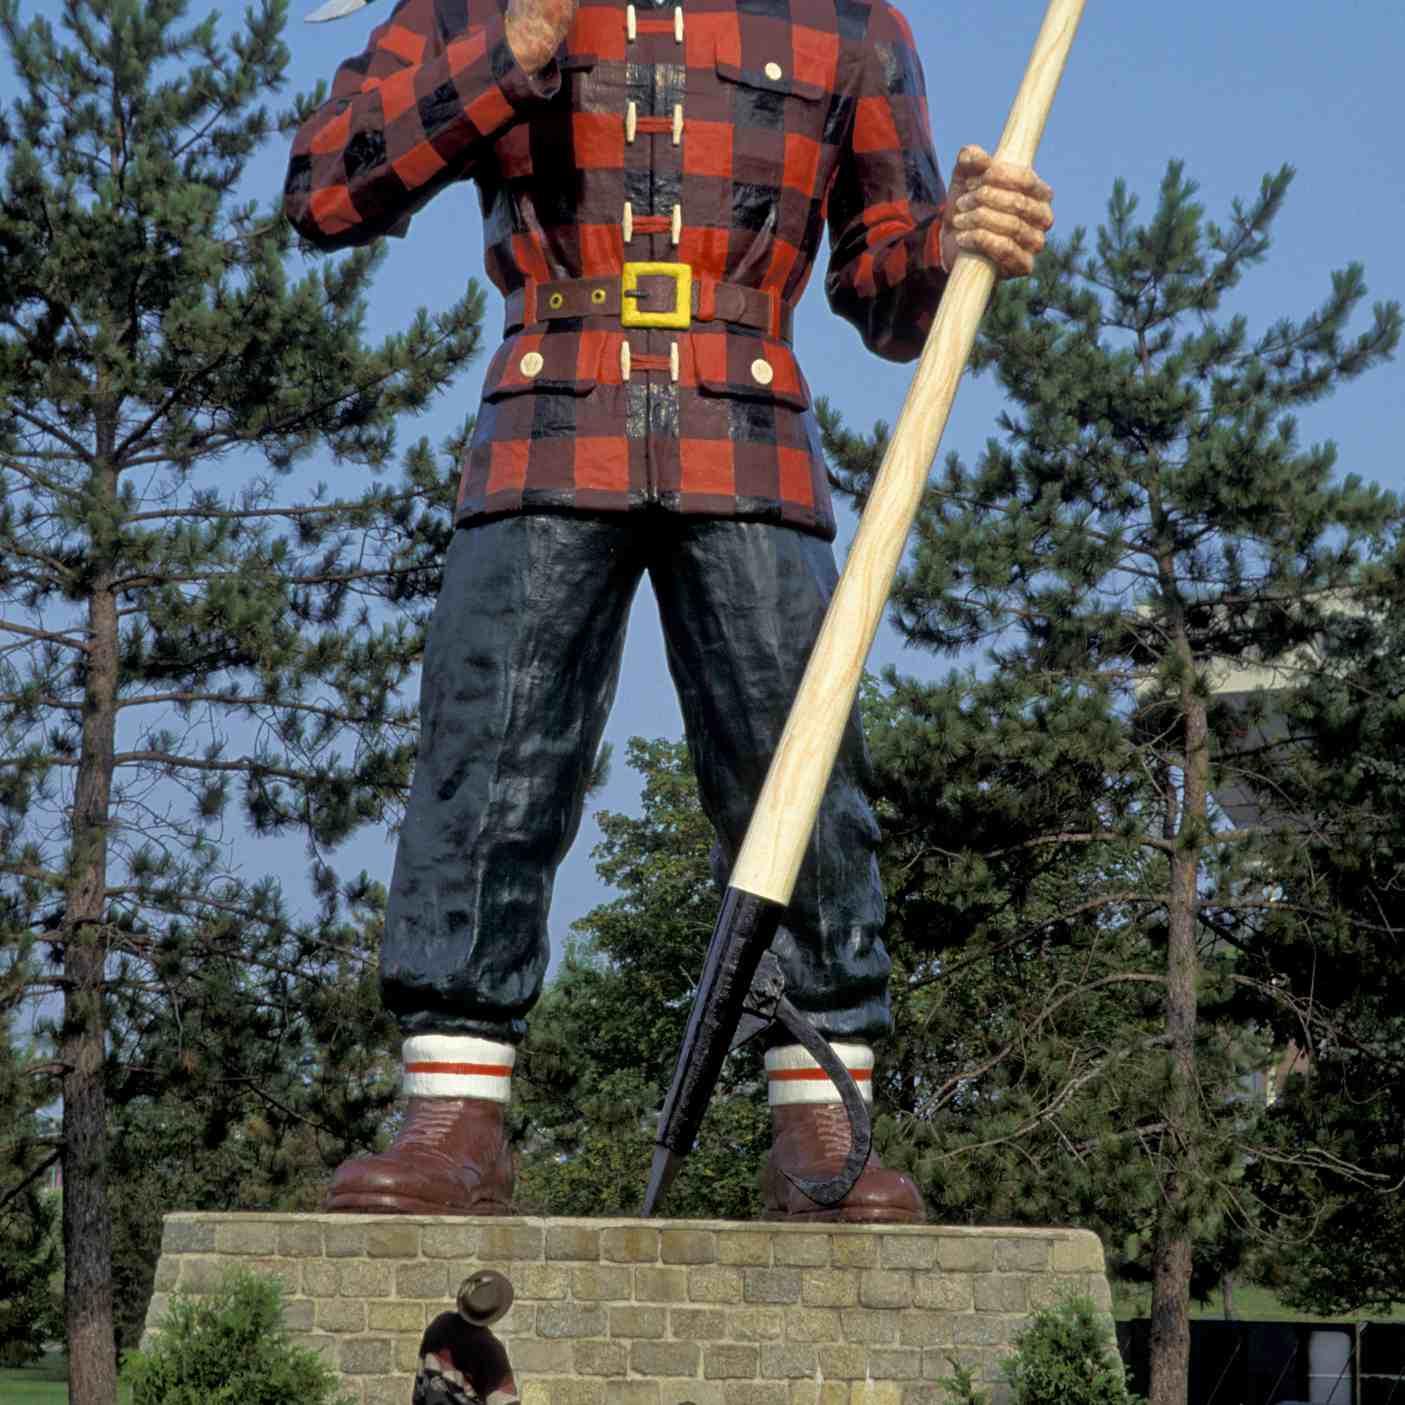 Giant Paul Bunyan Statue in Bangor, Maine